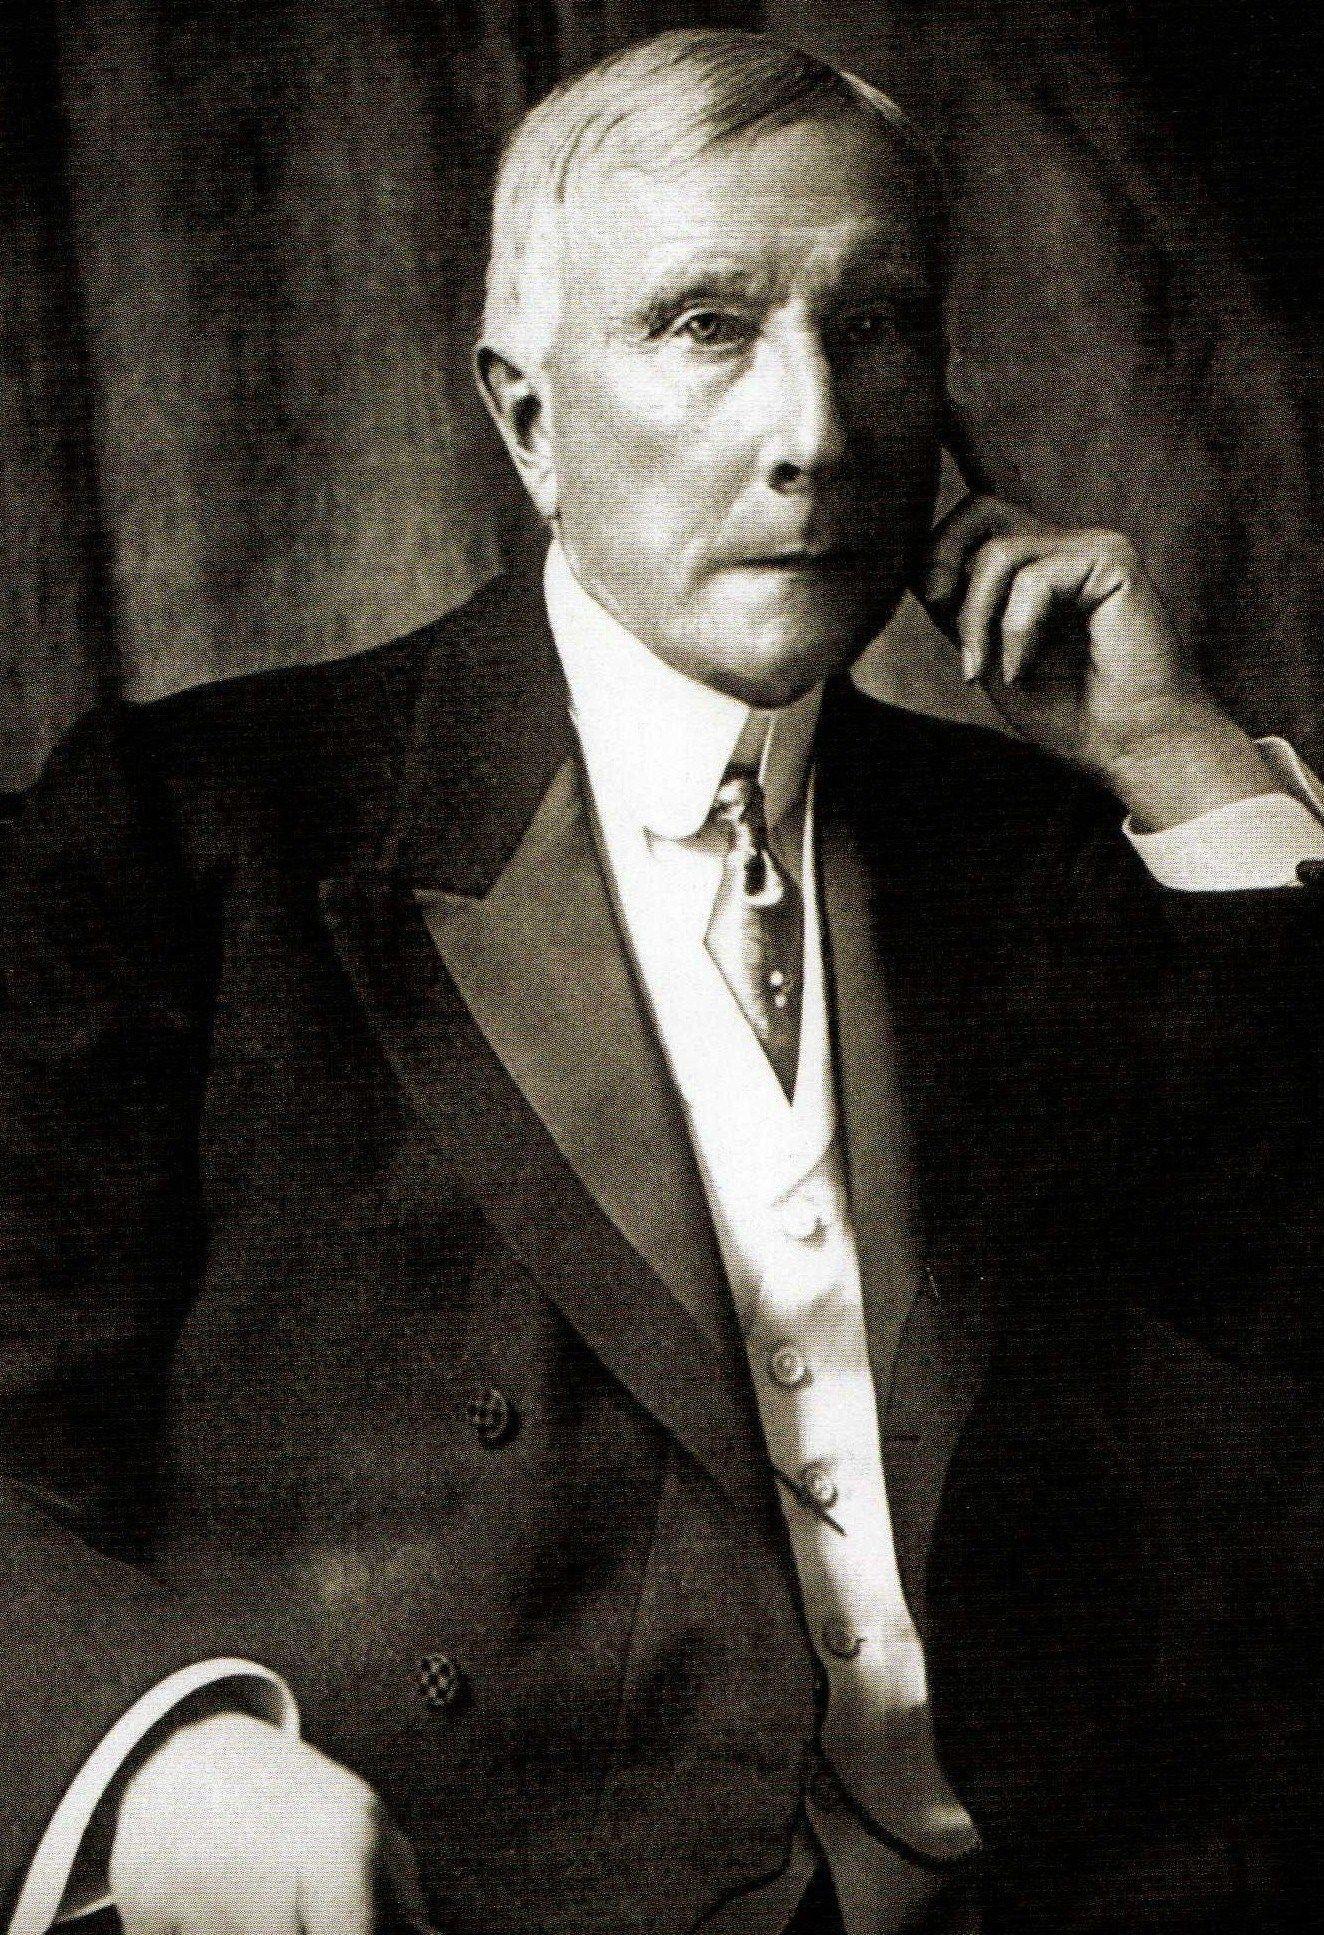 Who was John D. Rockefeller?